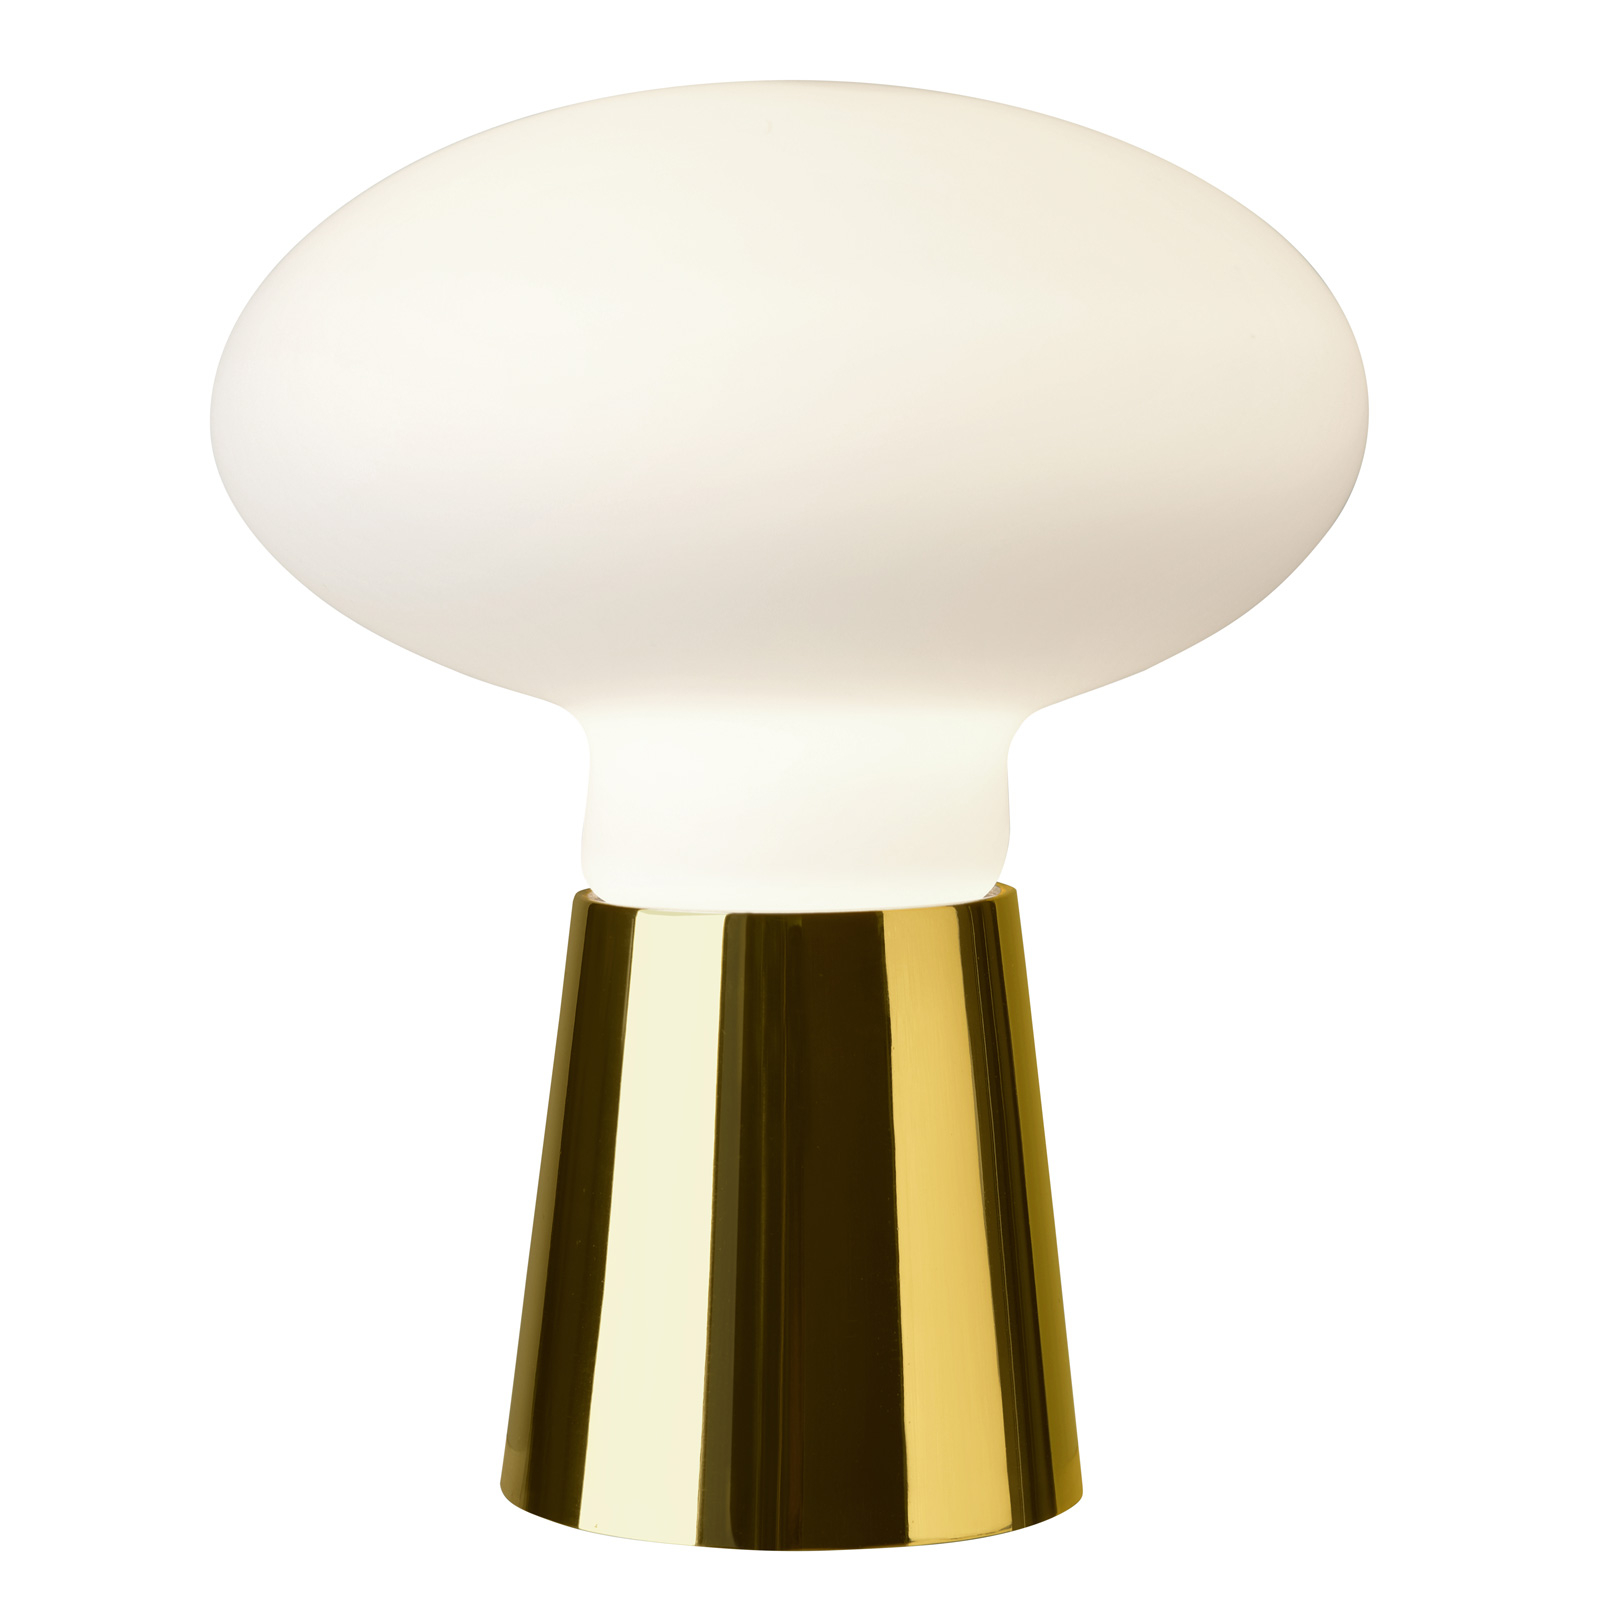 Villeroy & Boch Bilbao Tischlampe Goldoptik 35 cm